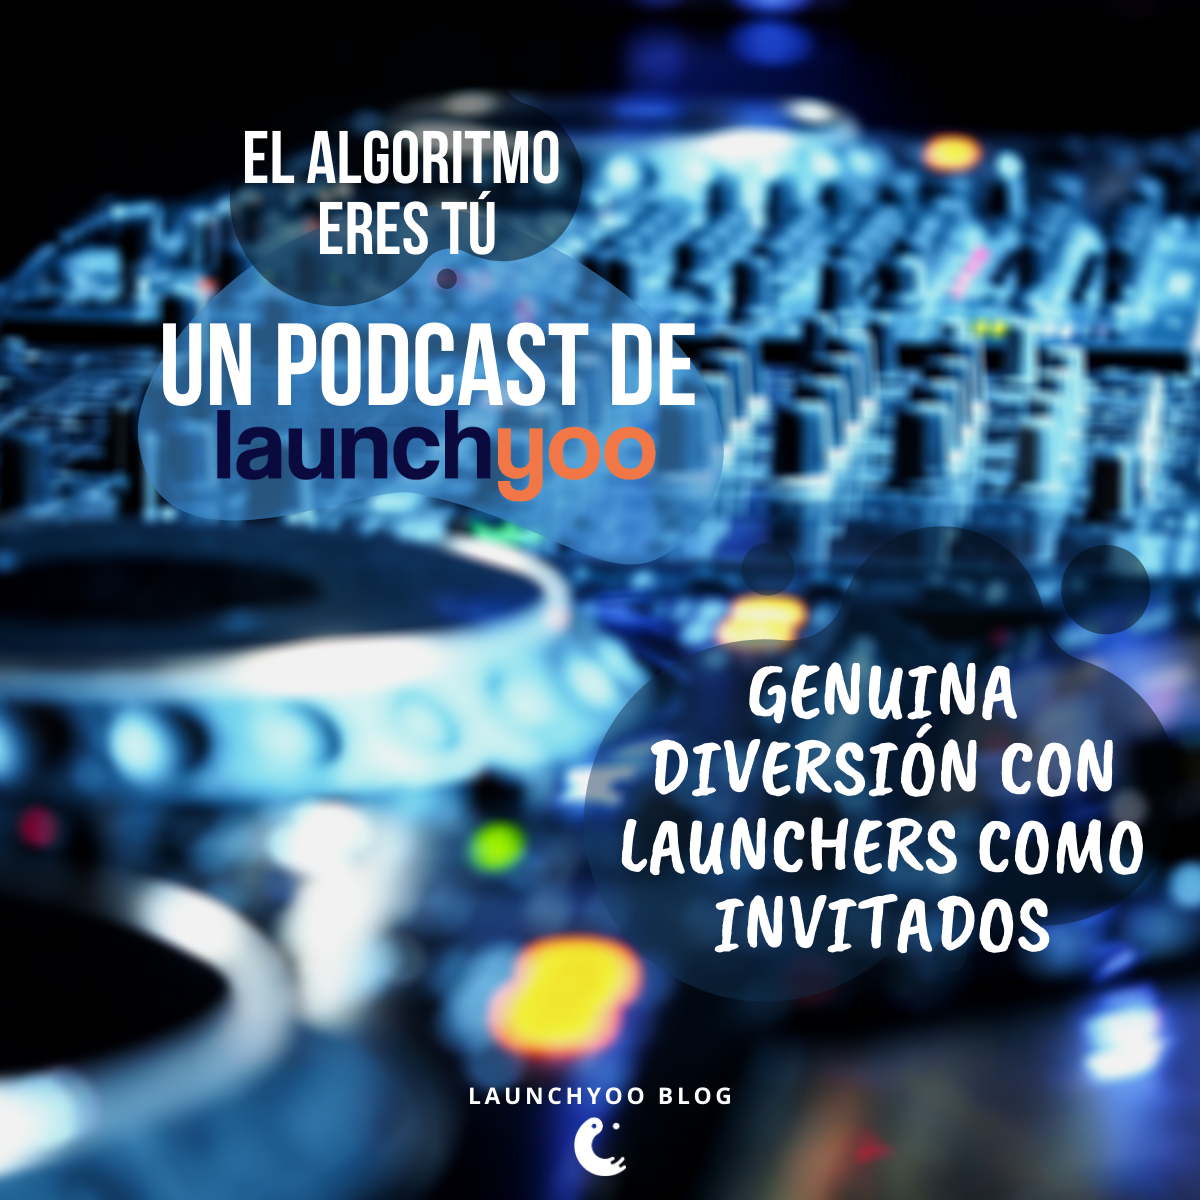 Los podcasts de Launchyoo.